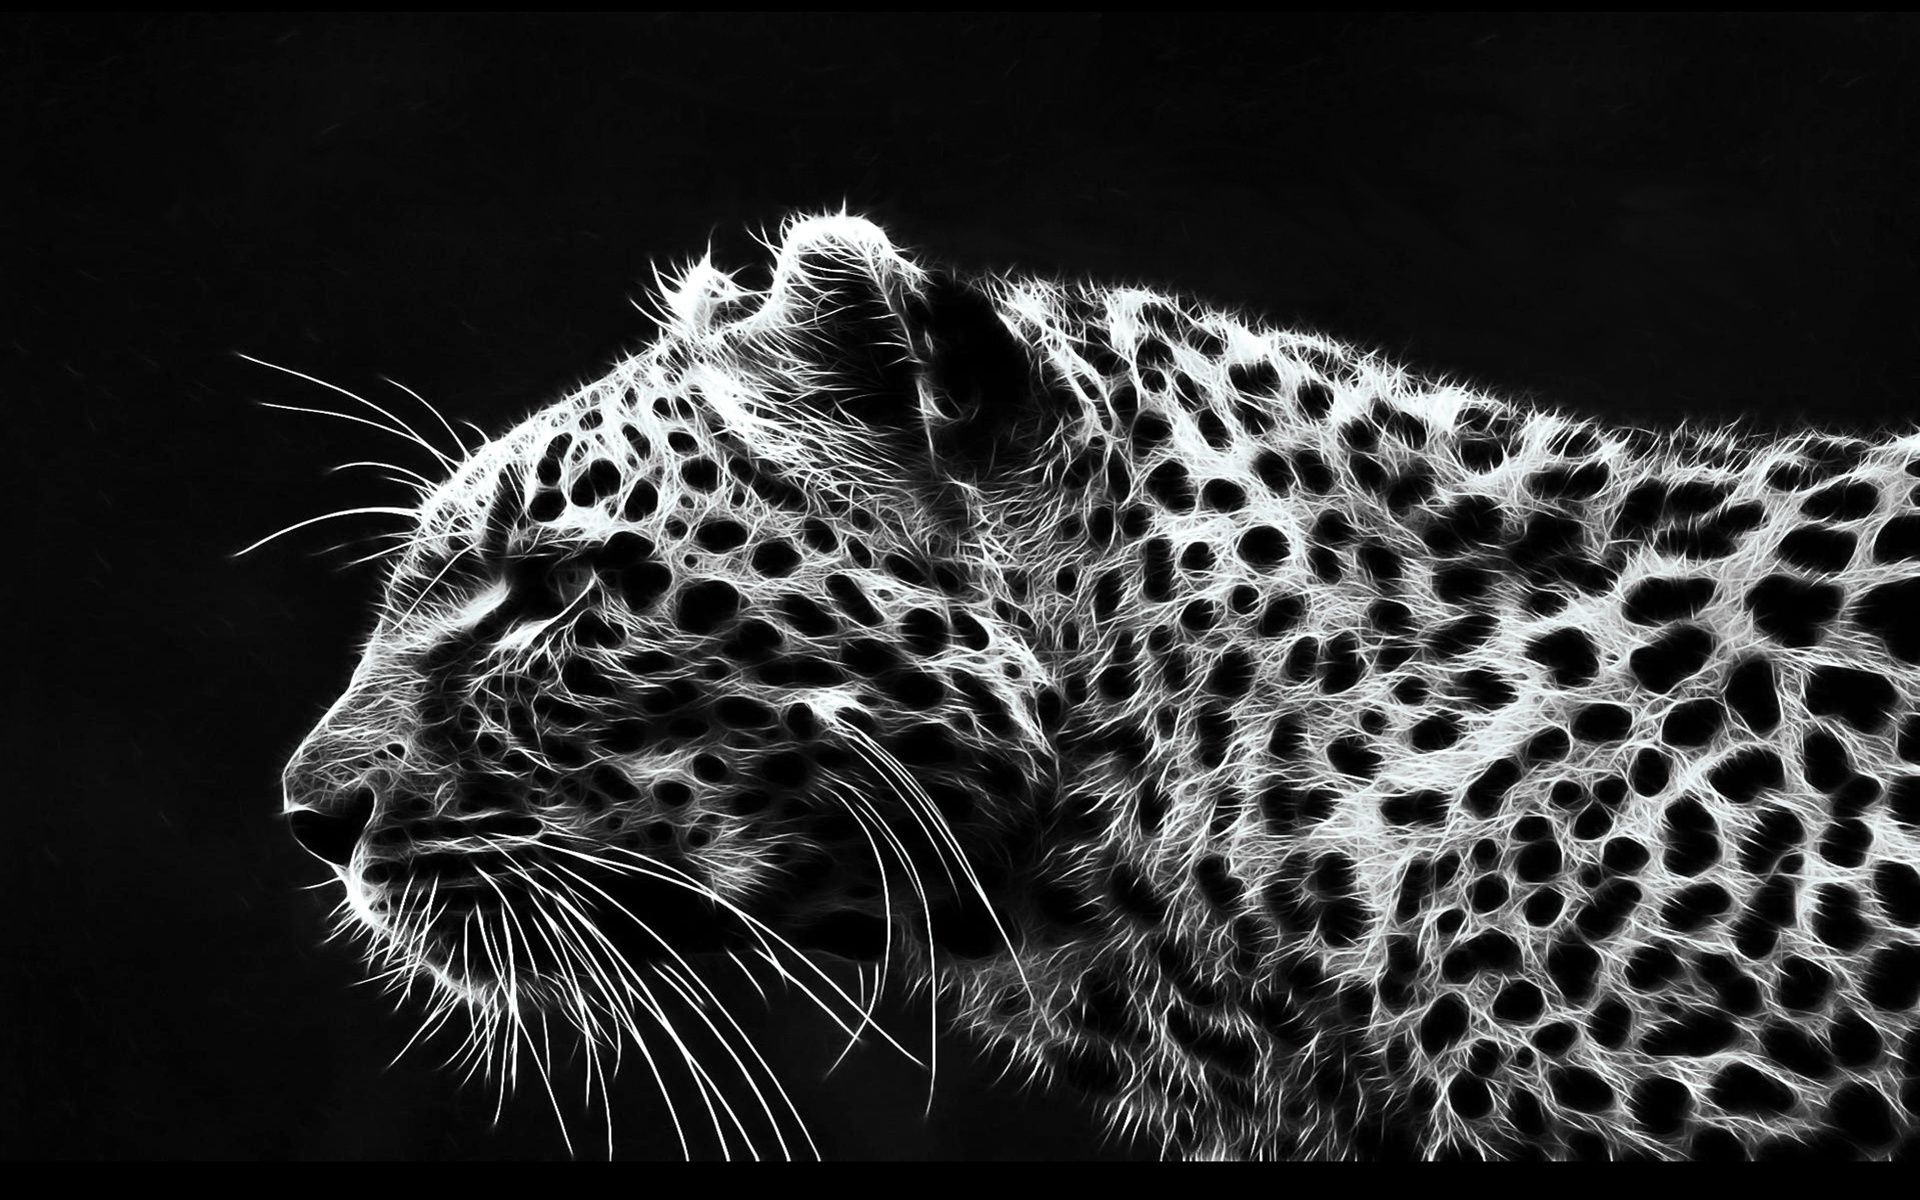 white cheetah wallpaper hd - photo #12